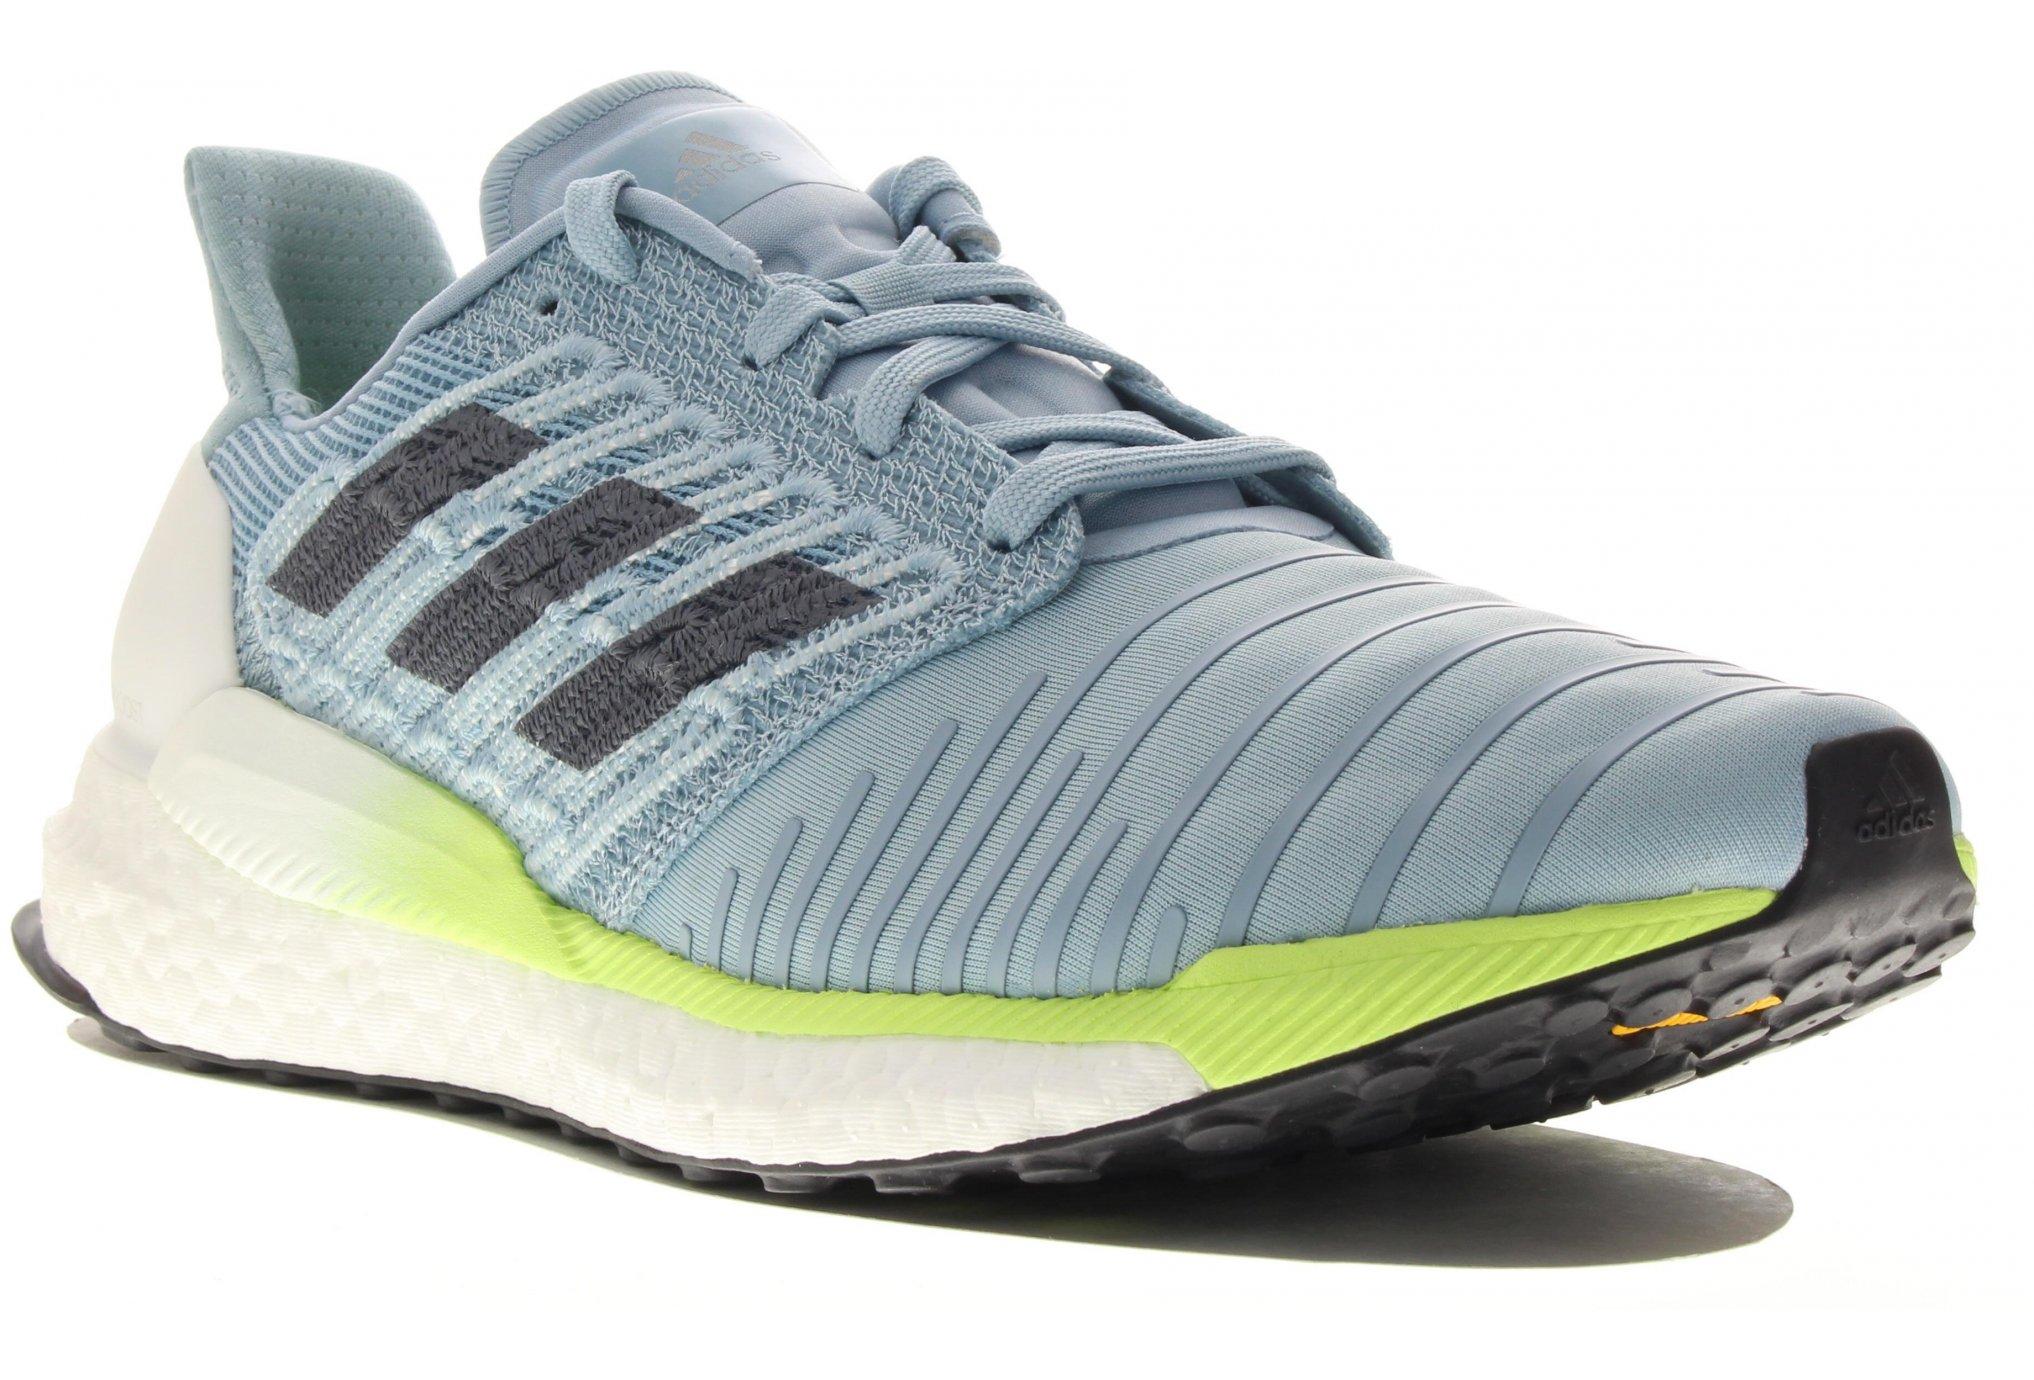 adidas Solar Boost Chaussures running femme